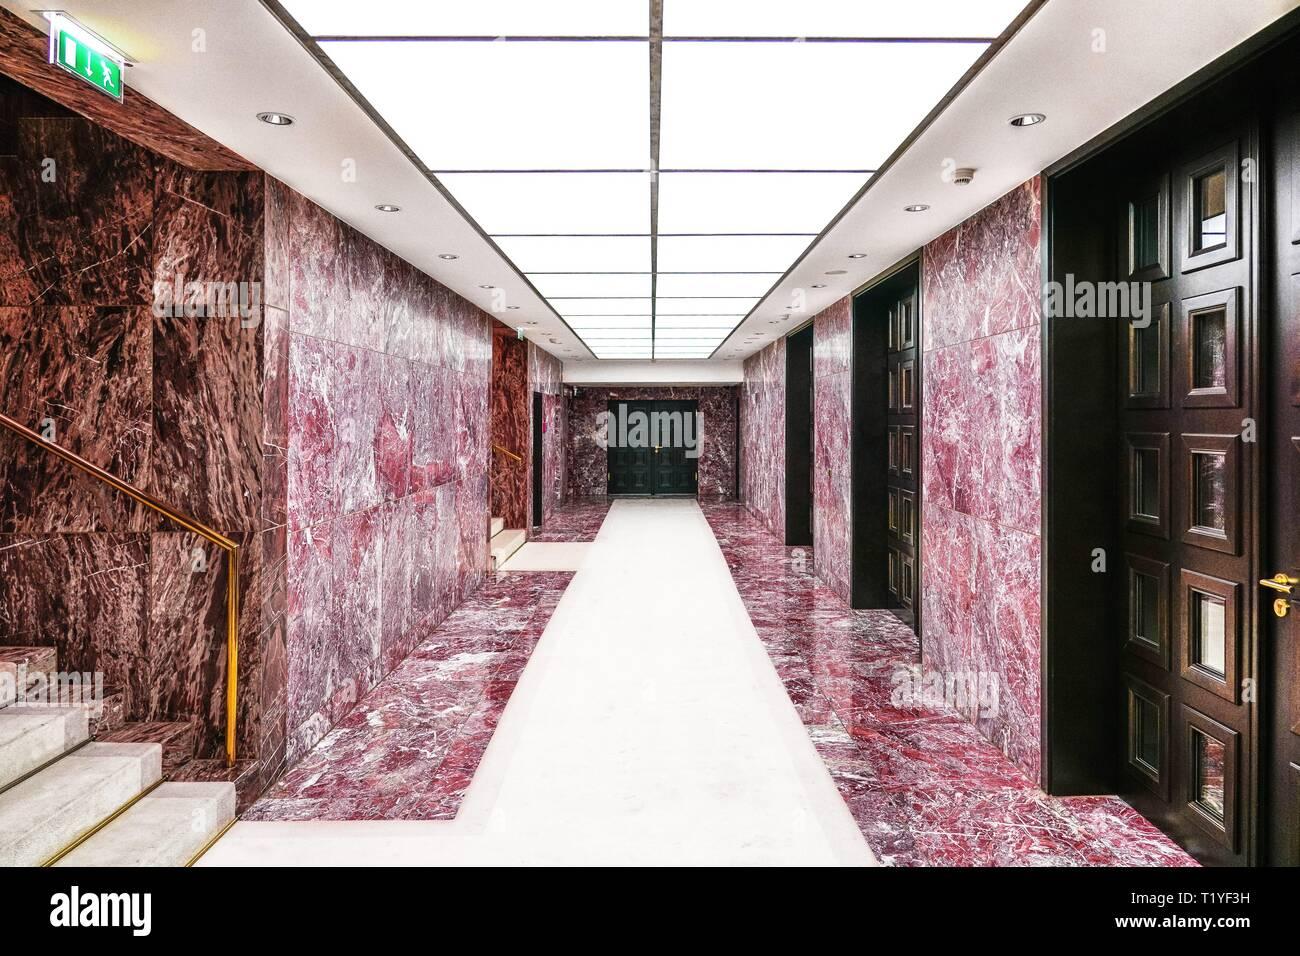 Puit De Lumiere Sol berlin, deutschland. 08th mar, 2019. 06.03.2019, un couloir